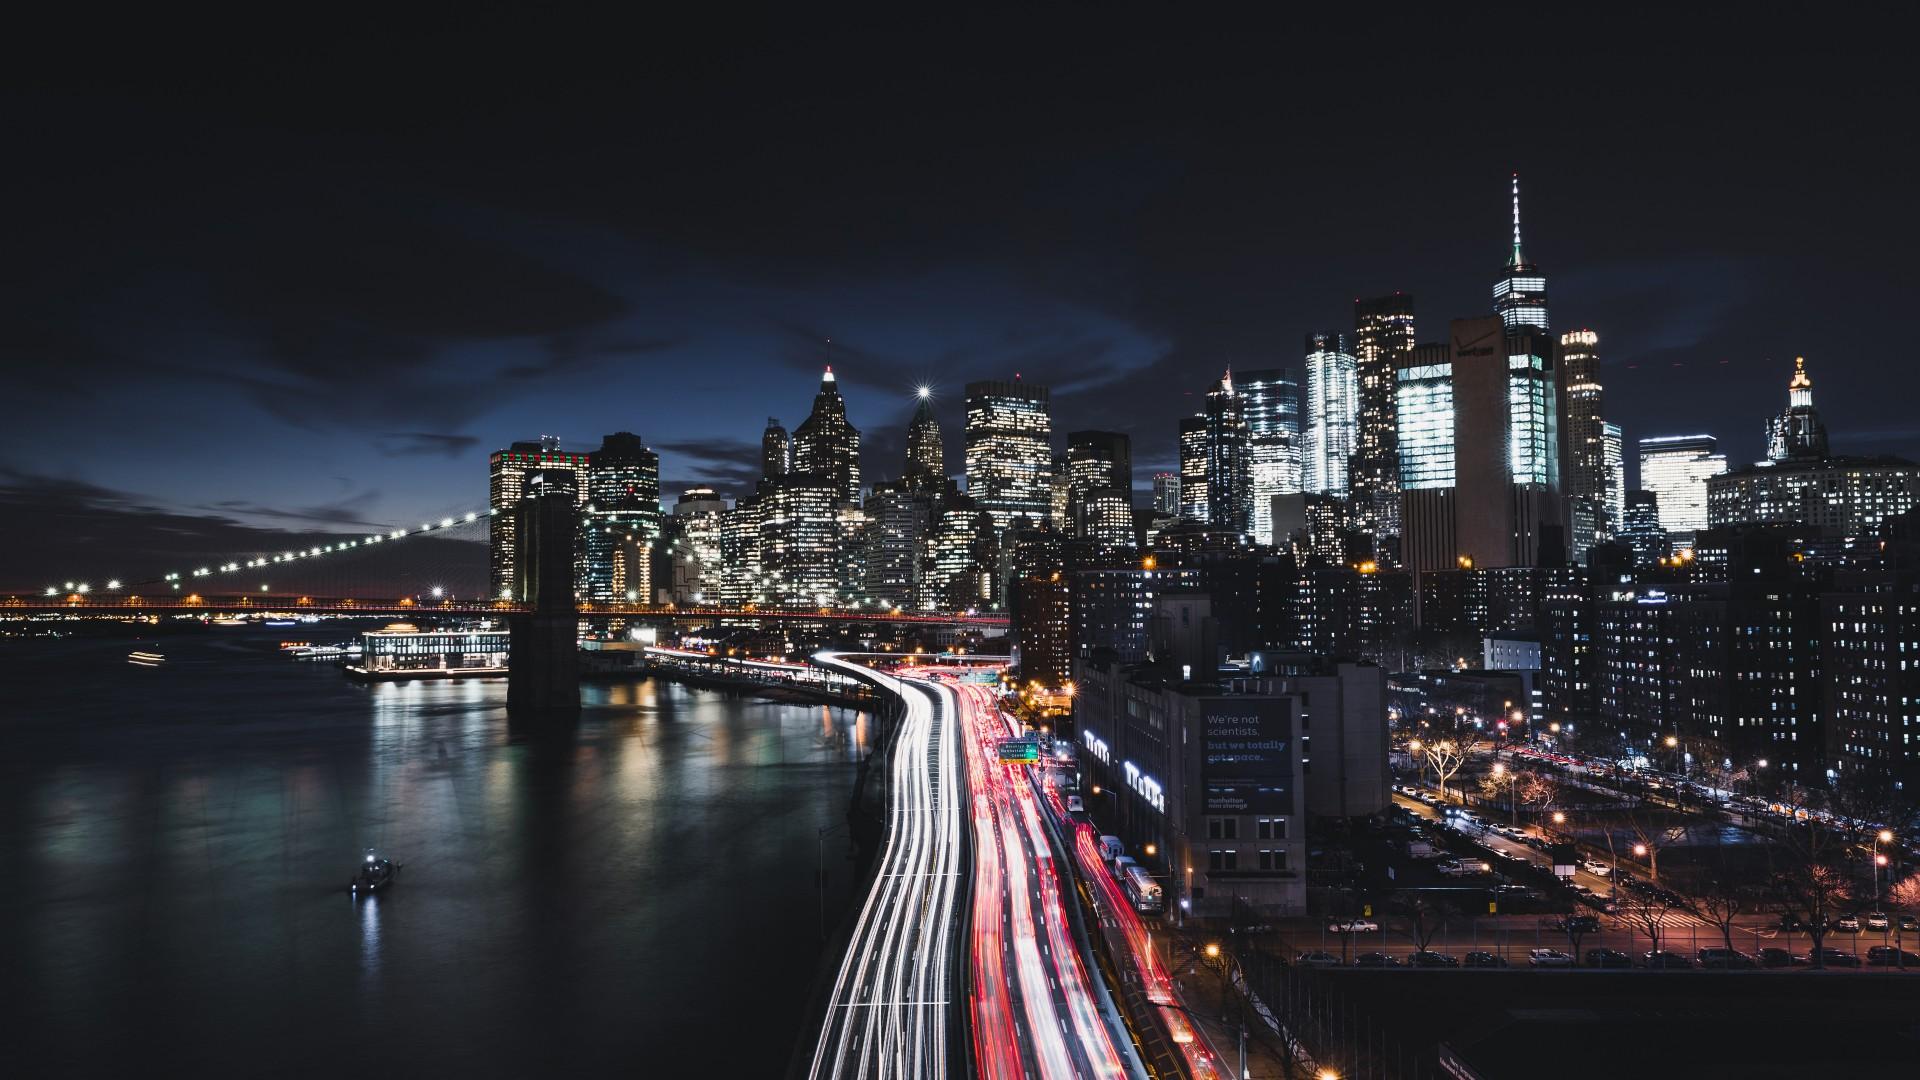 29 New York City At Night Wallpaper On Wallpapersafari